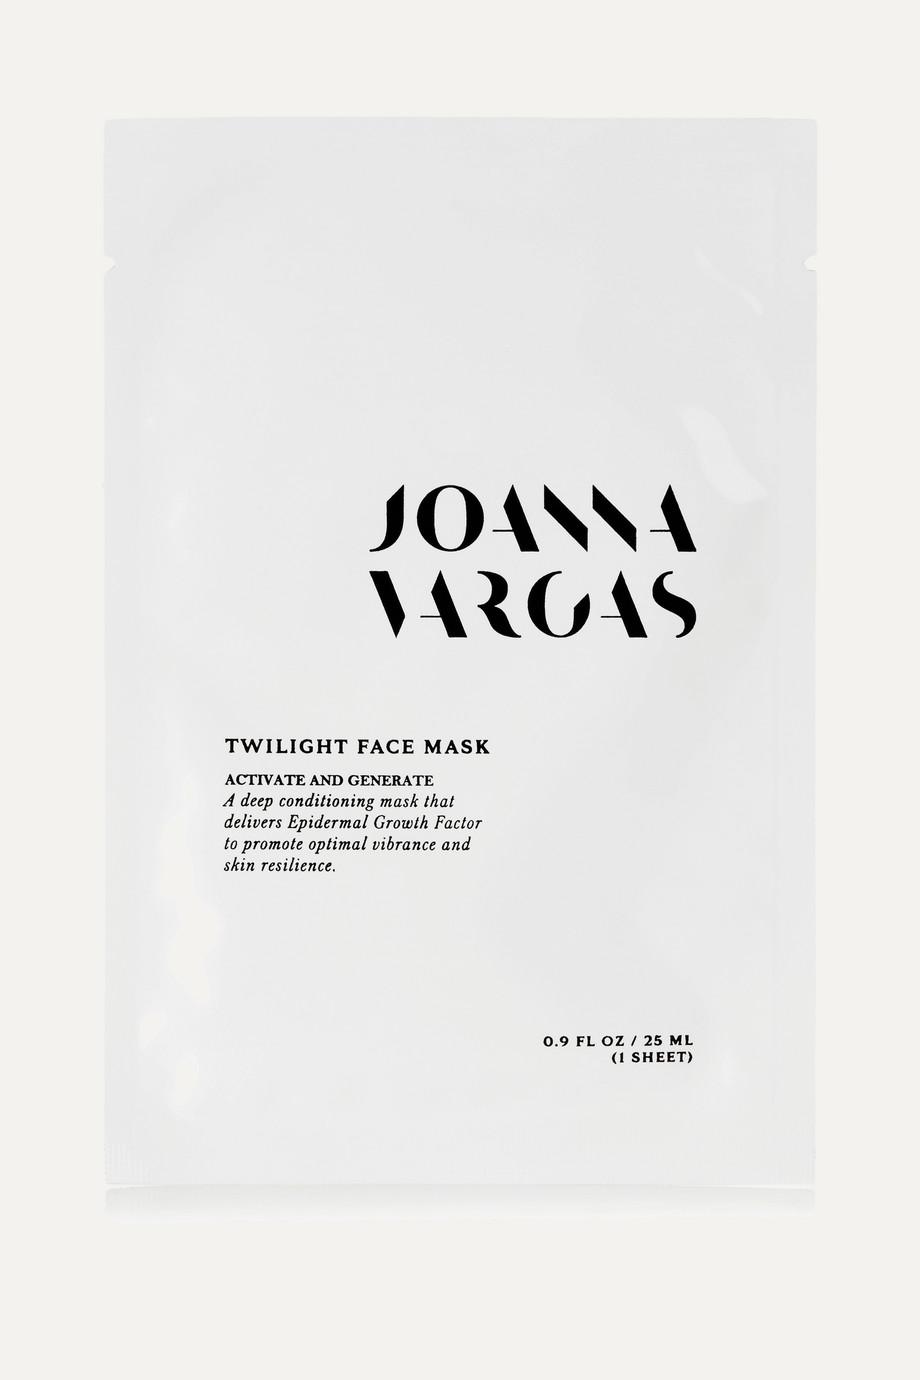 Joanna Vargas Twilight Face Mask, 5 x 25 ml – Gesichtsmasken